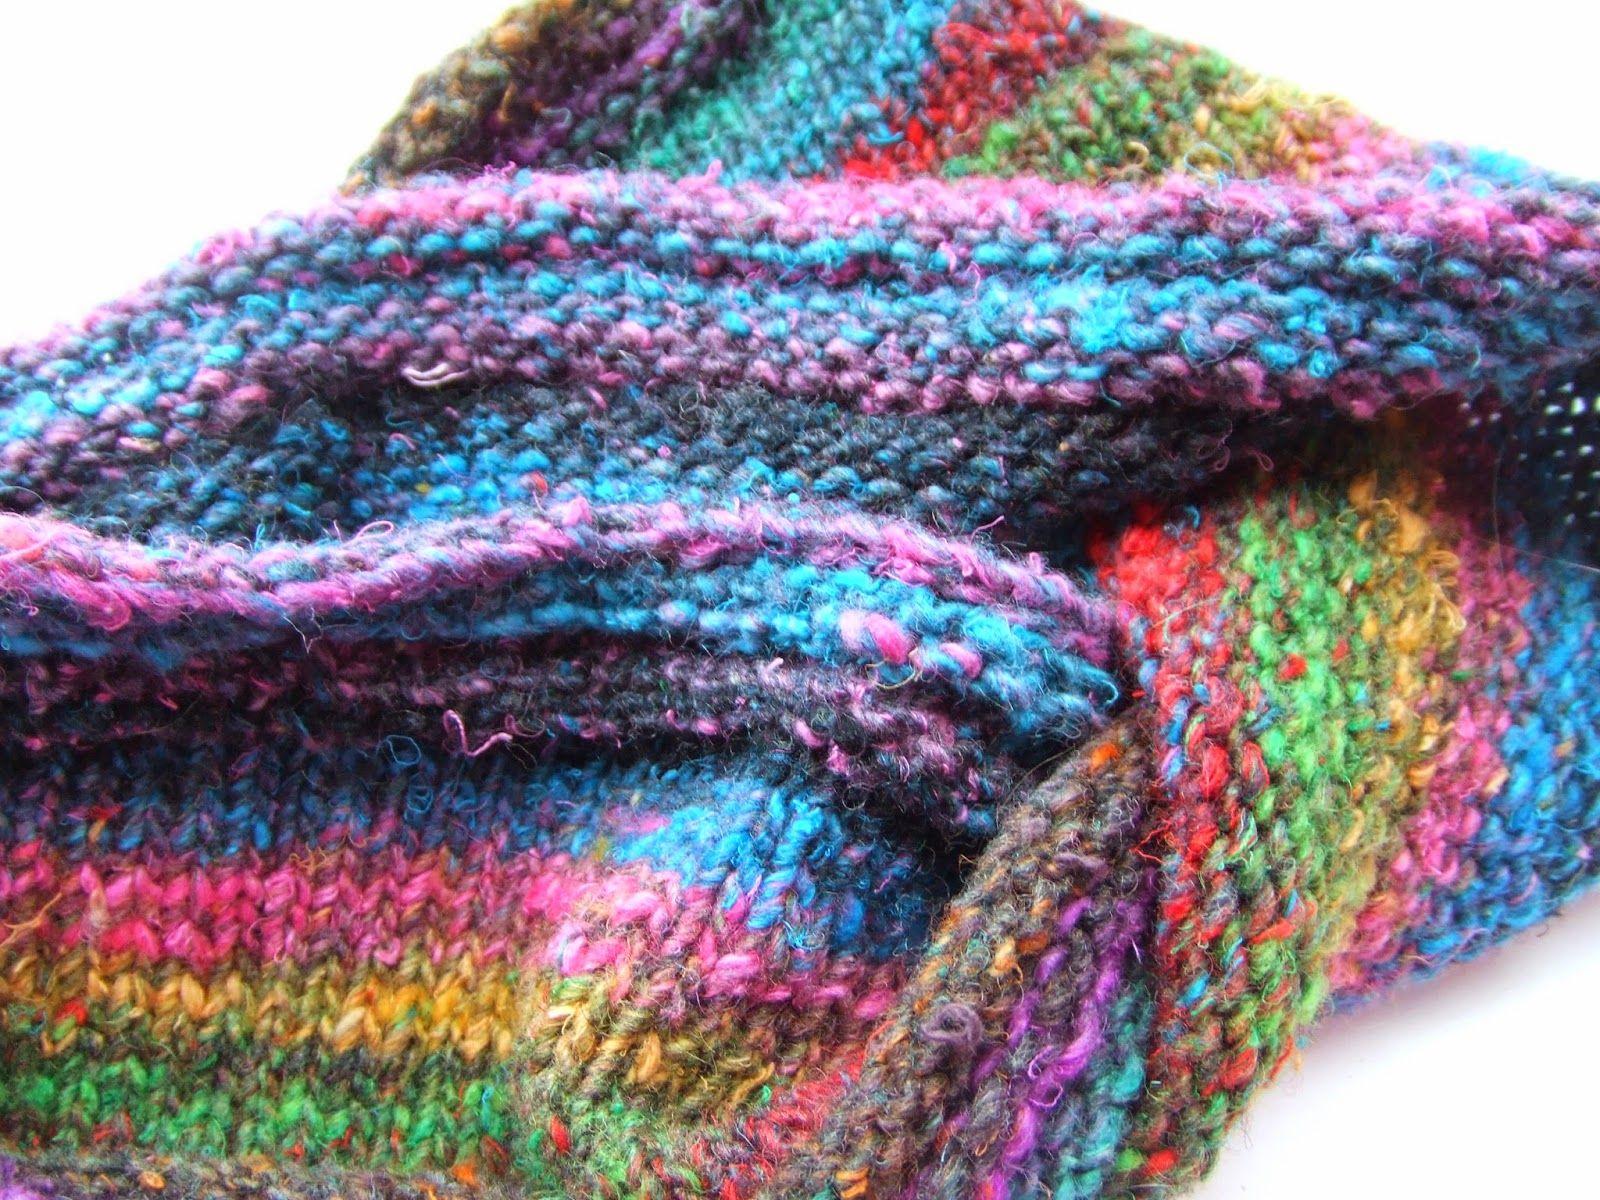 Noro Yarn Patterns Unique Design